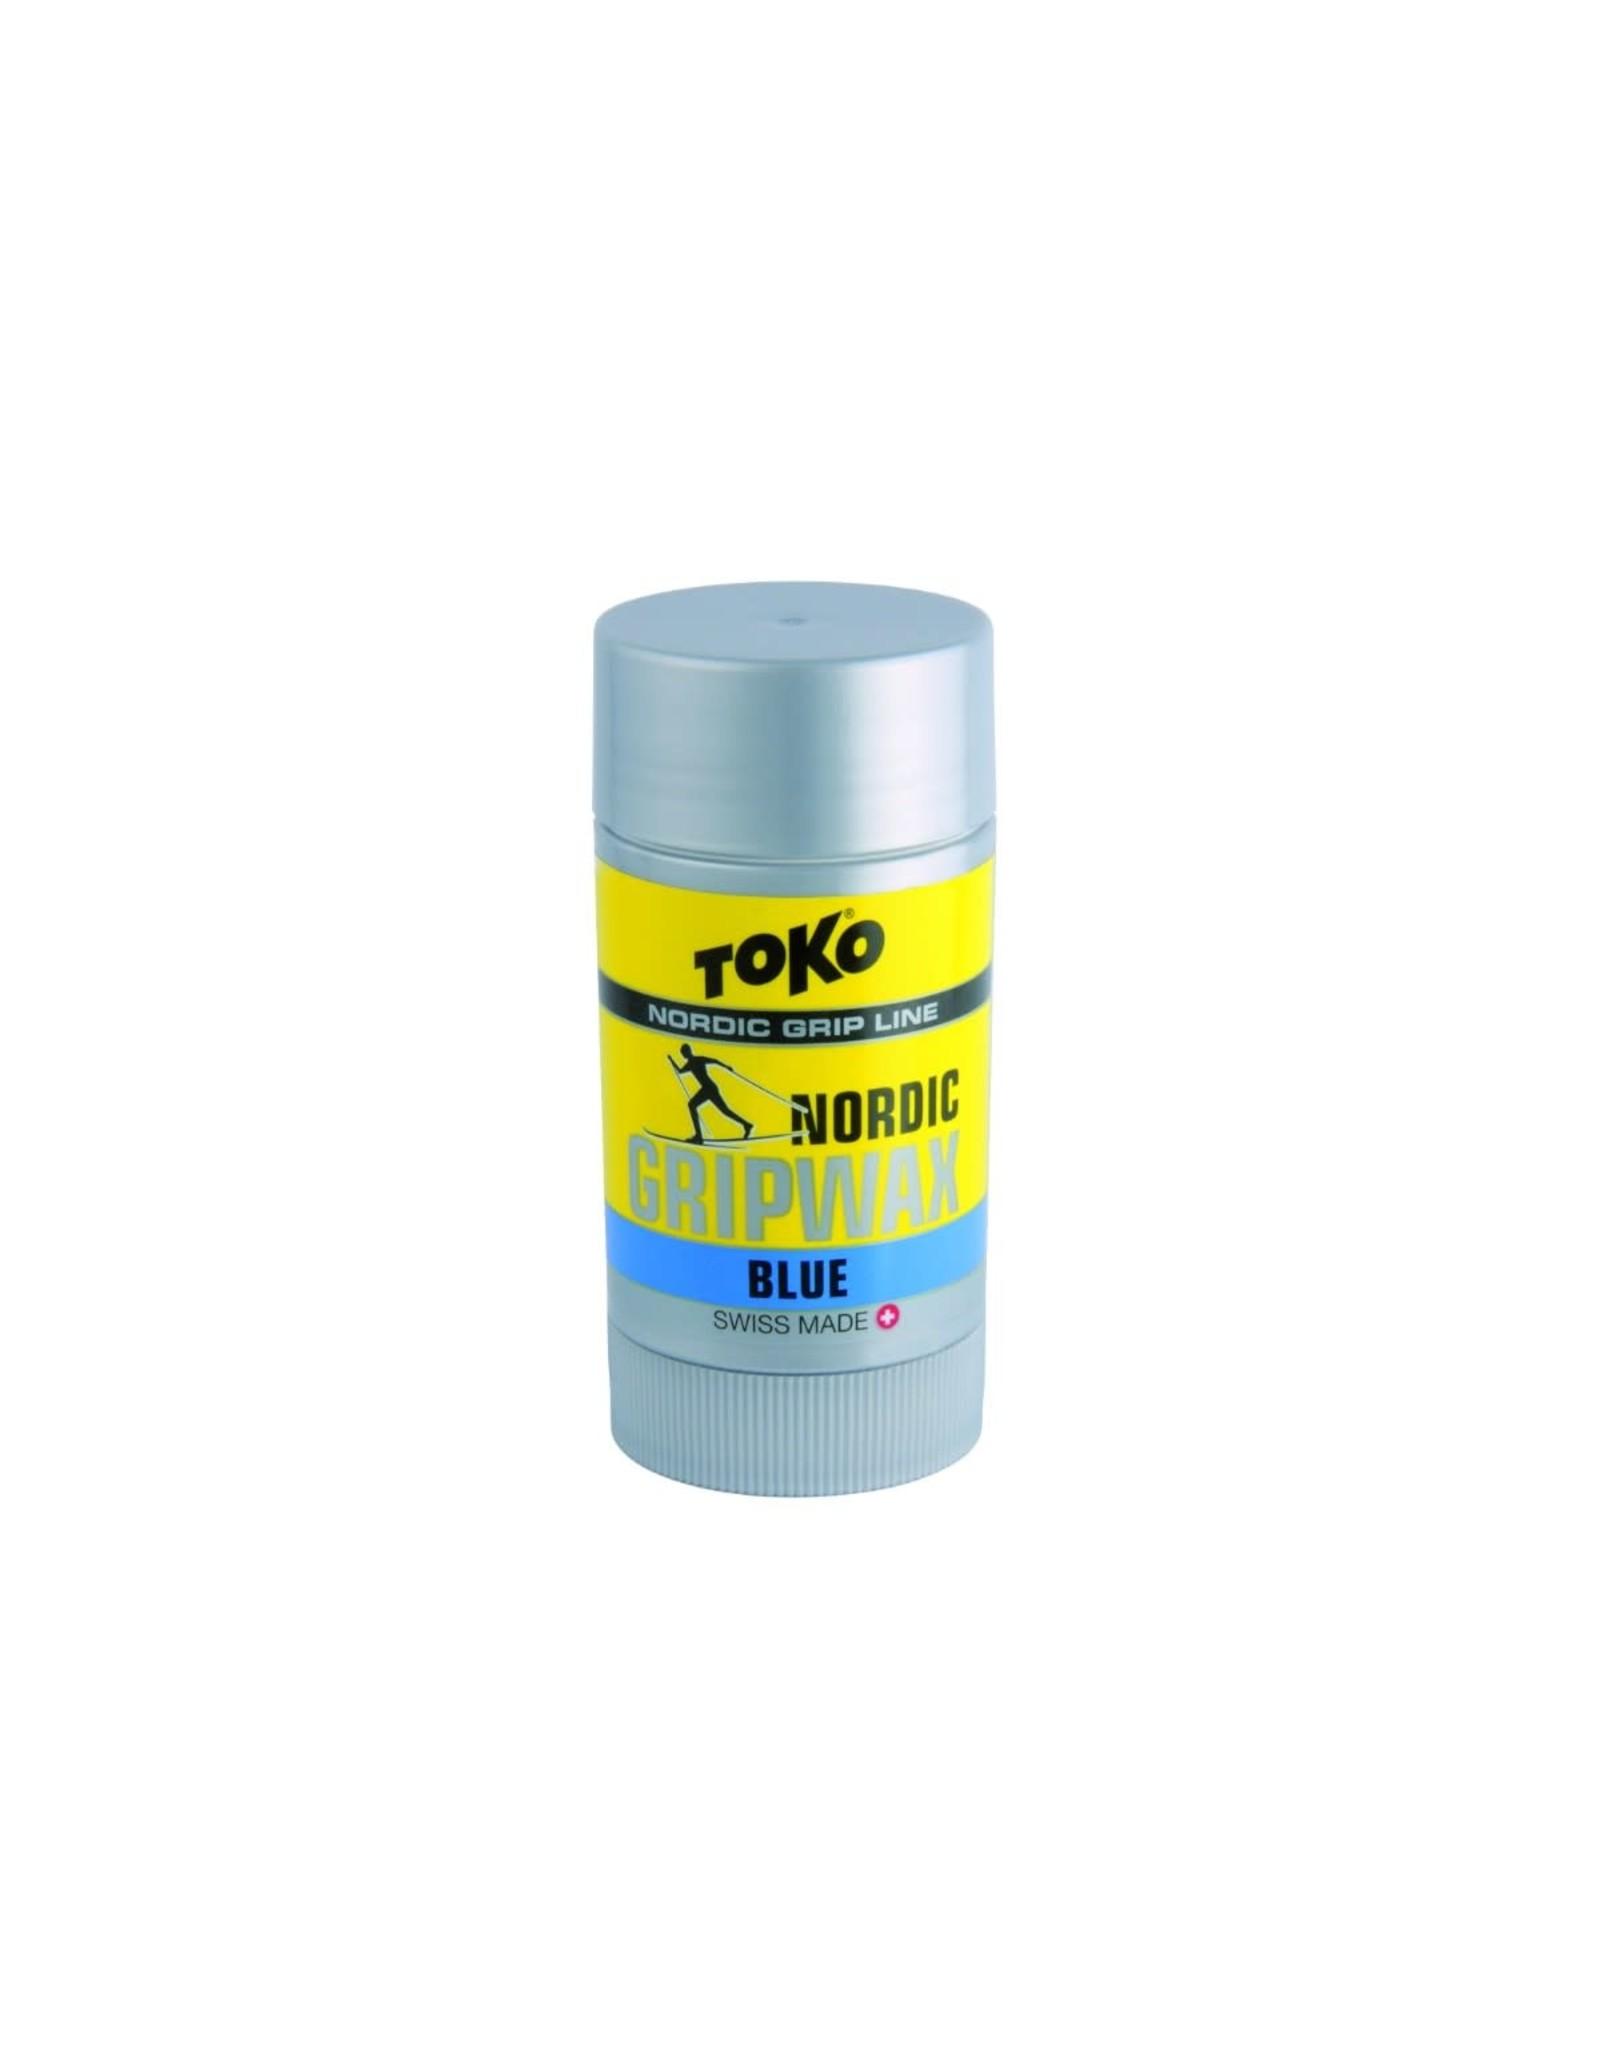 Toko Toko Nordic Grip Wax Blue